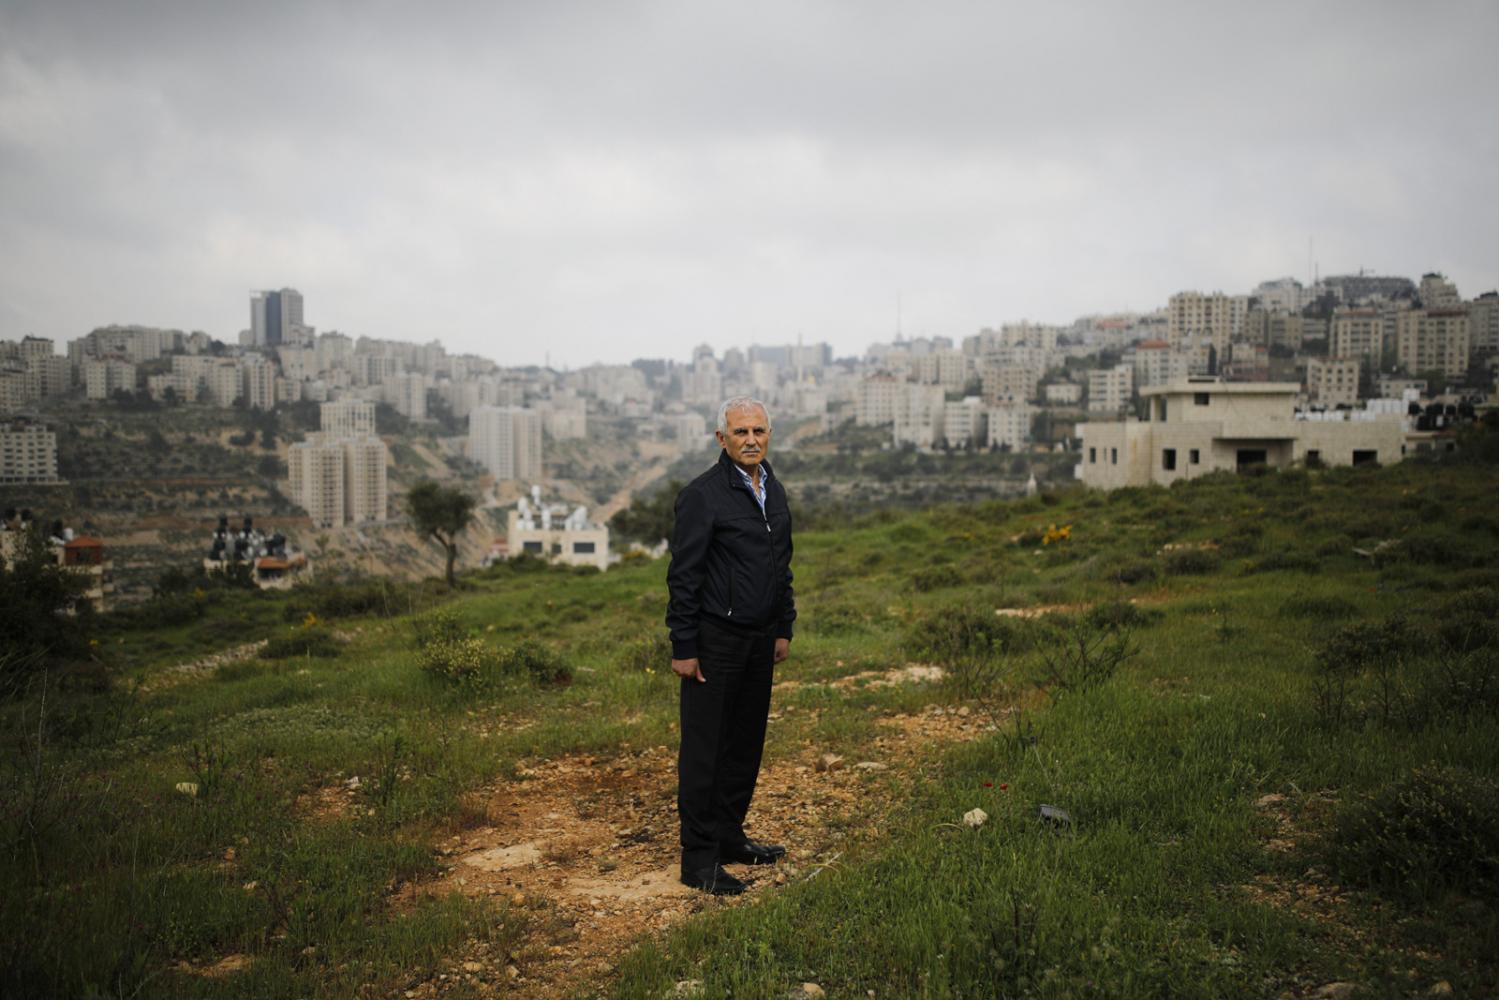 RAMALLAH, WESTBANK - APRIL 14, 2019: Portrait of Palestinian Jamal Zakou, 61, near his home in Ramallah, Westbank. CREDIT: Corinna Kern for The New York Times